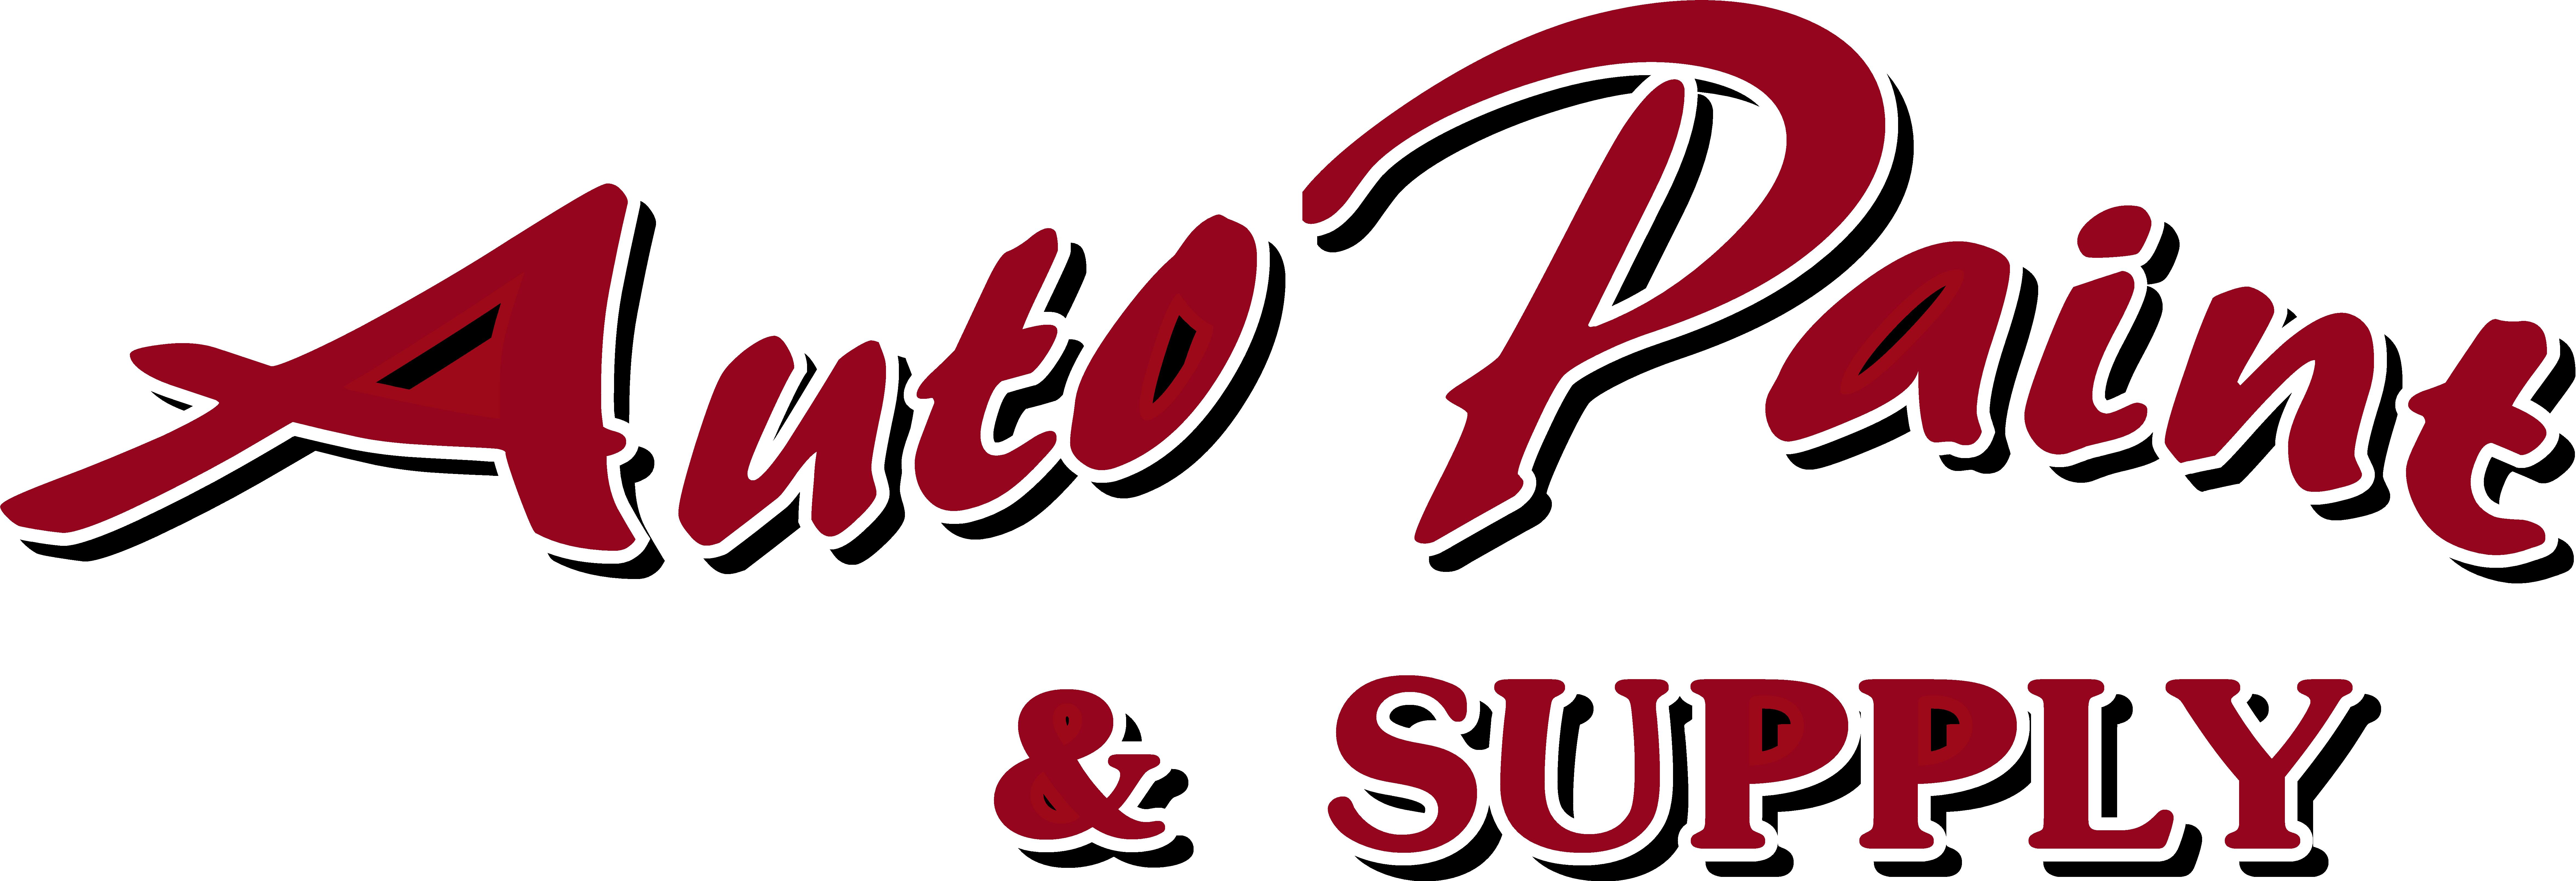 Auto Paint & Supply Co., Inc. logo